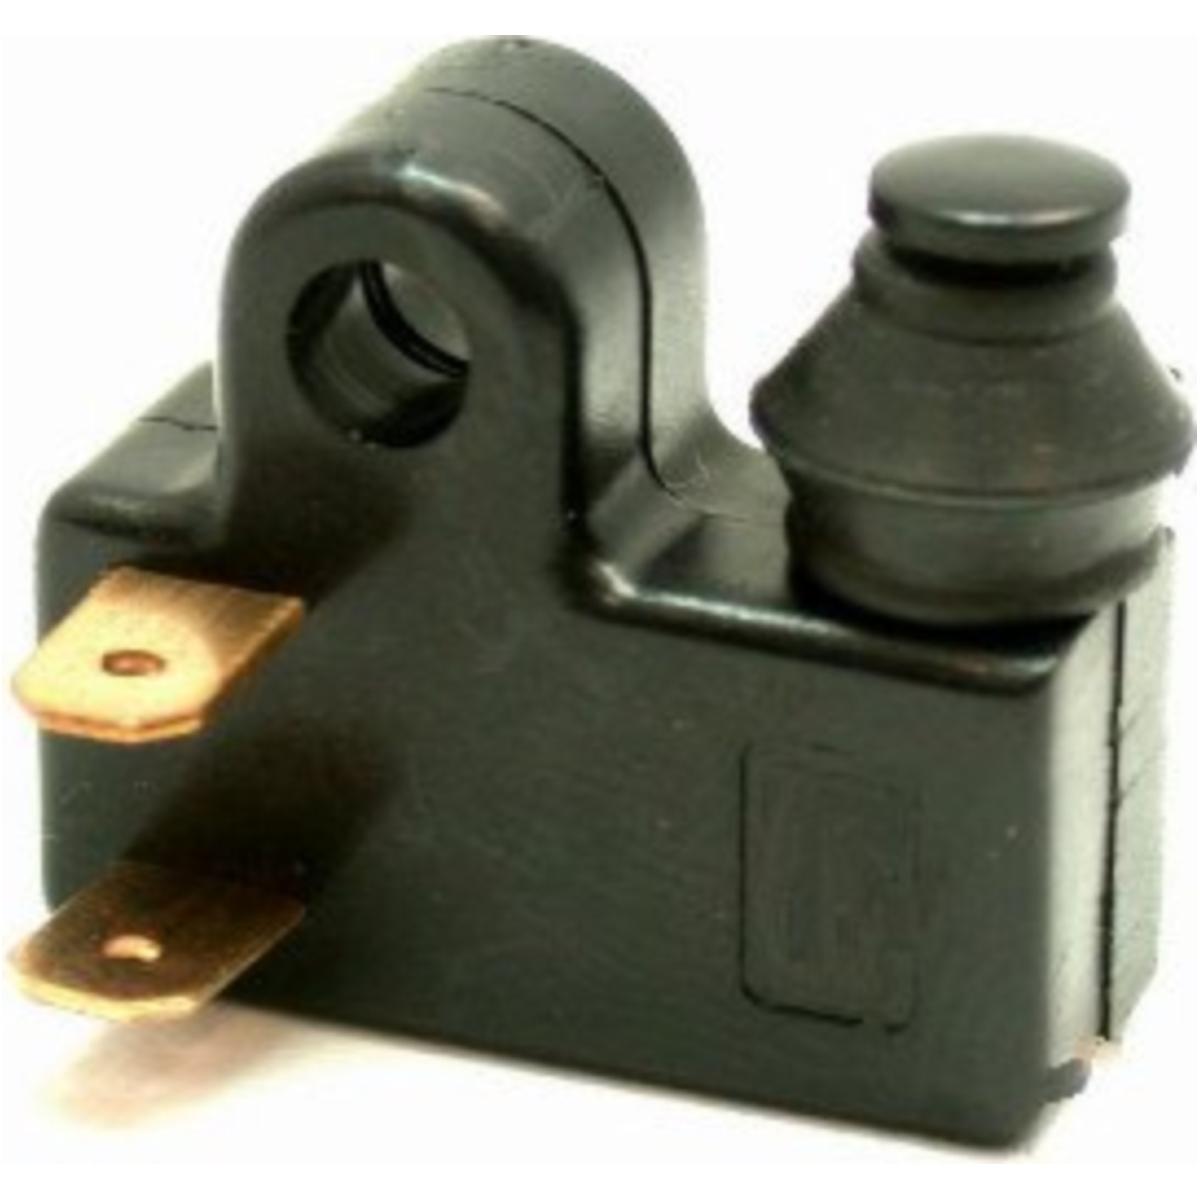 Clutch cut out switch jmp BD220038 Yamaha YP A 34B1 SH054 2008 59923 (400  34 PS, 25 kw Majesty ABS) - en